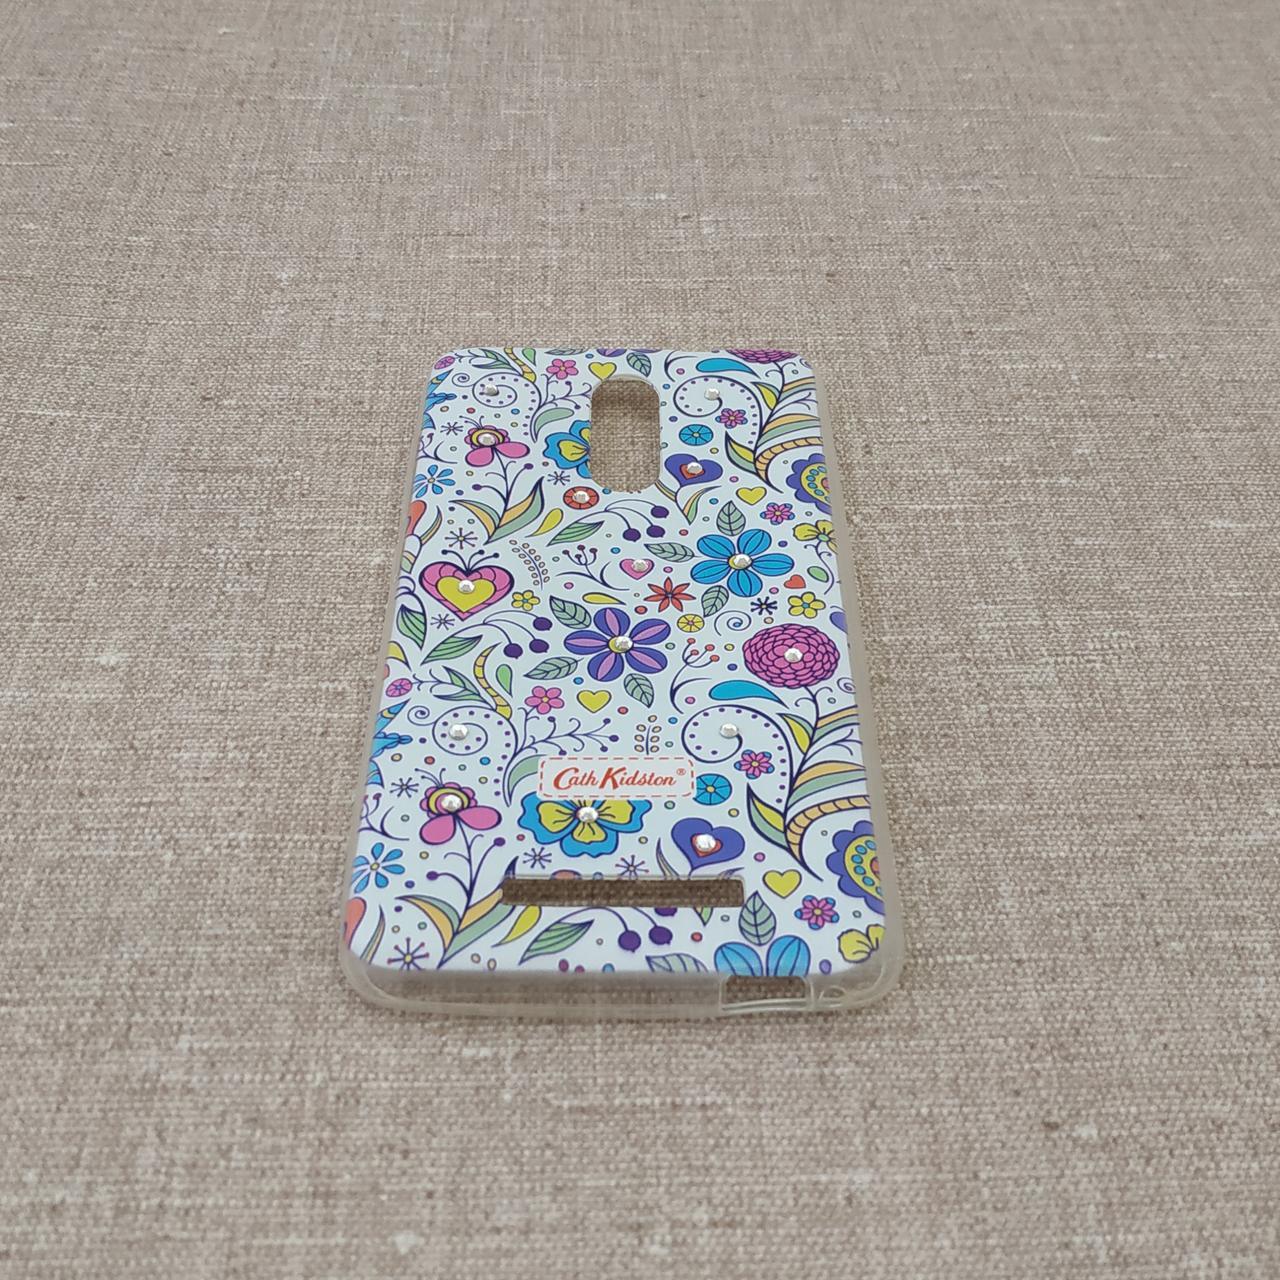 Чехлы для Xiaomi Redmi Note 3 / Pro TPU Diamond